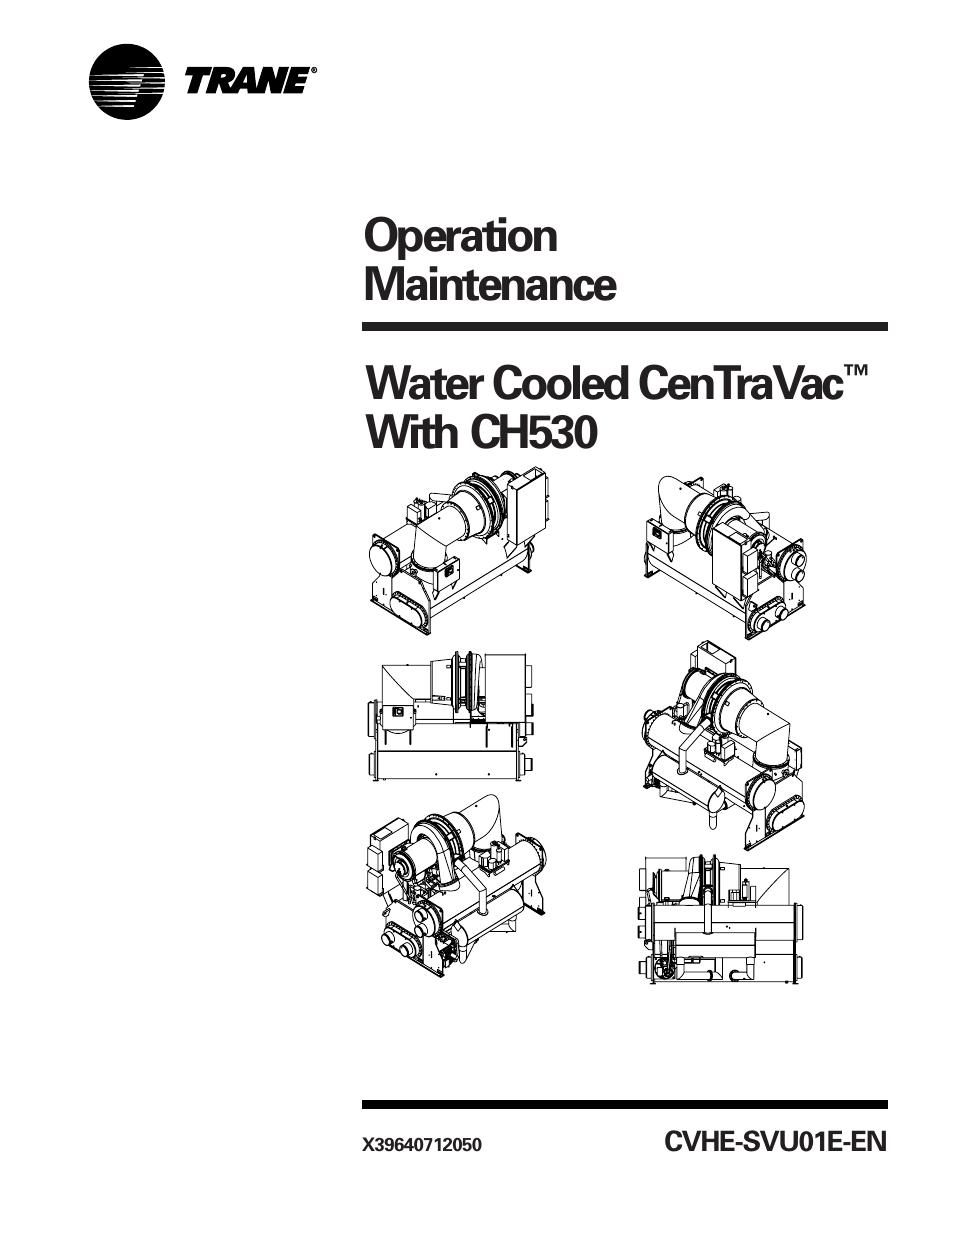 trane cvhe svu01e enx39640712050 user manual 112 pages rh manualsdir com Trane Cvhe Chiller Manuals Trane CenTraVac Chiller